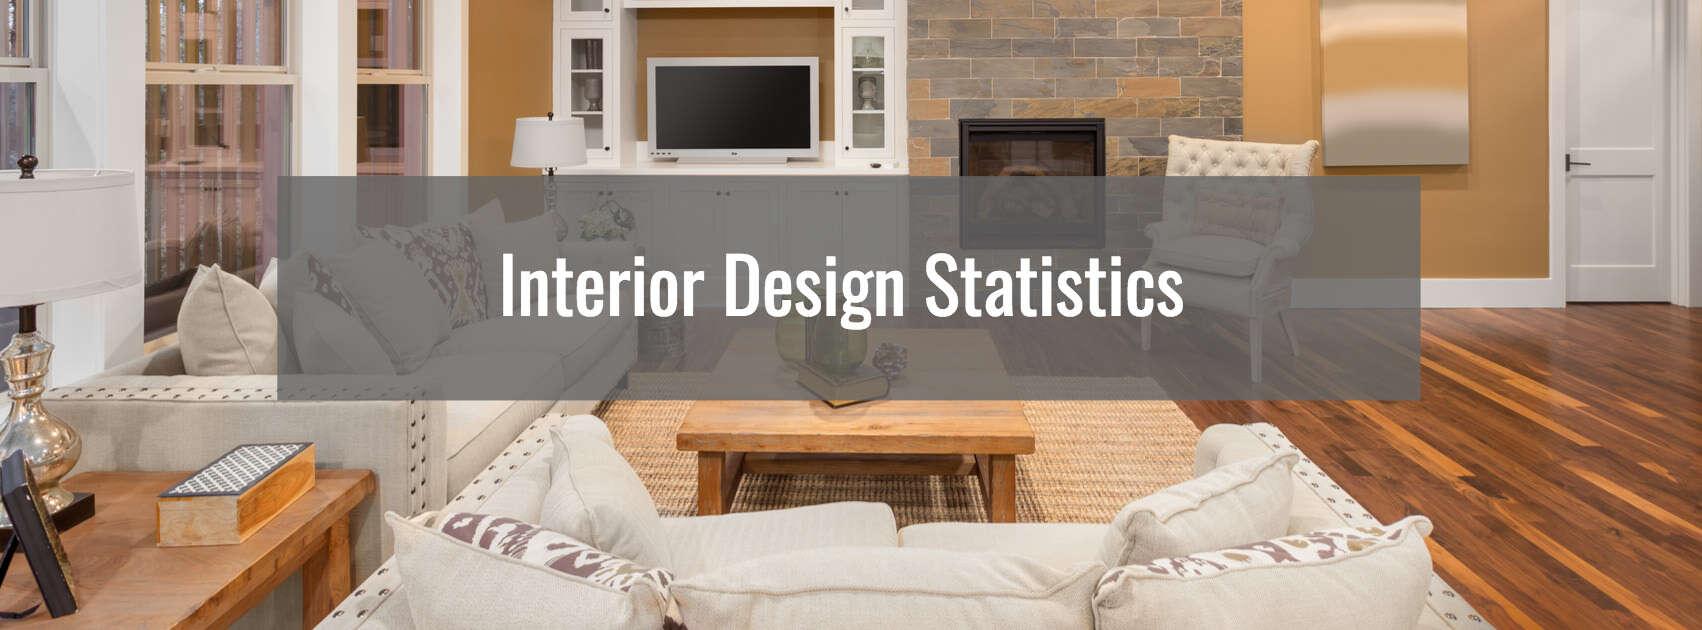 100 39 s of useful interior design statistics home stratosphere Home stratosphere s interior design software free